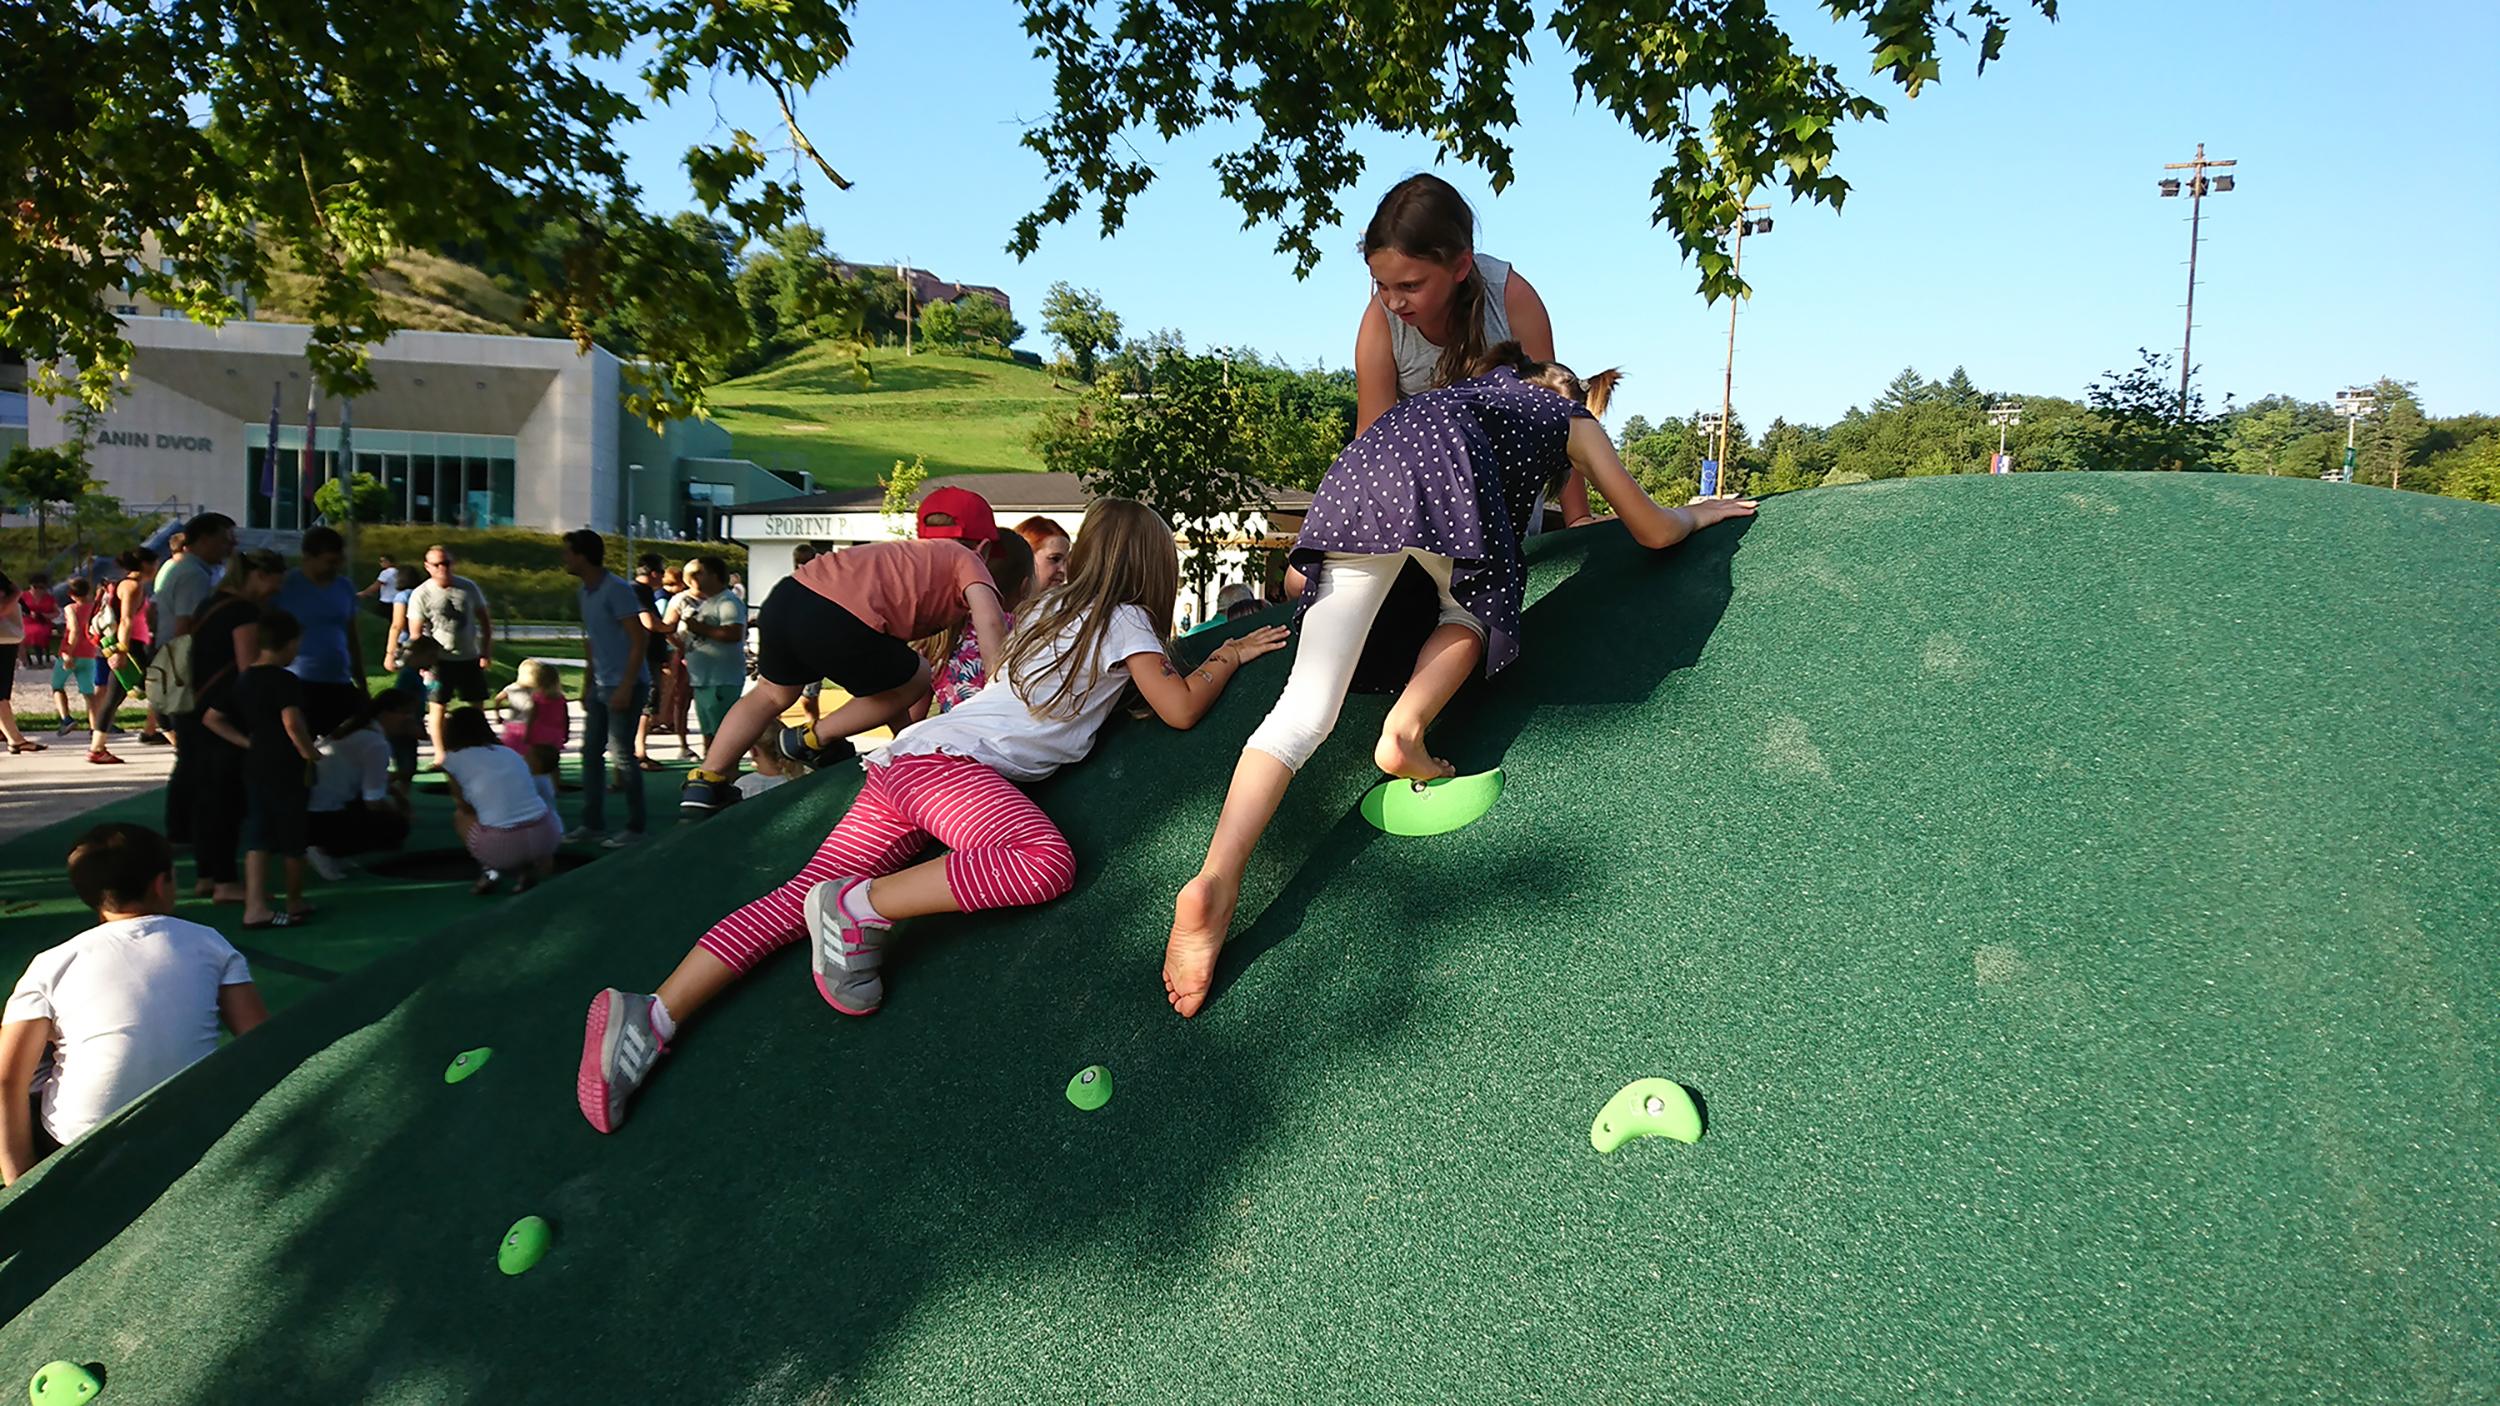 igrišče bruto rogaška slatina playground children